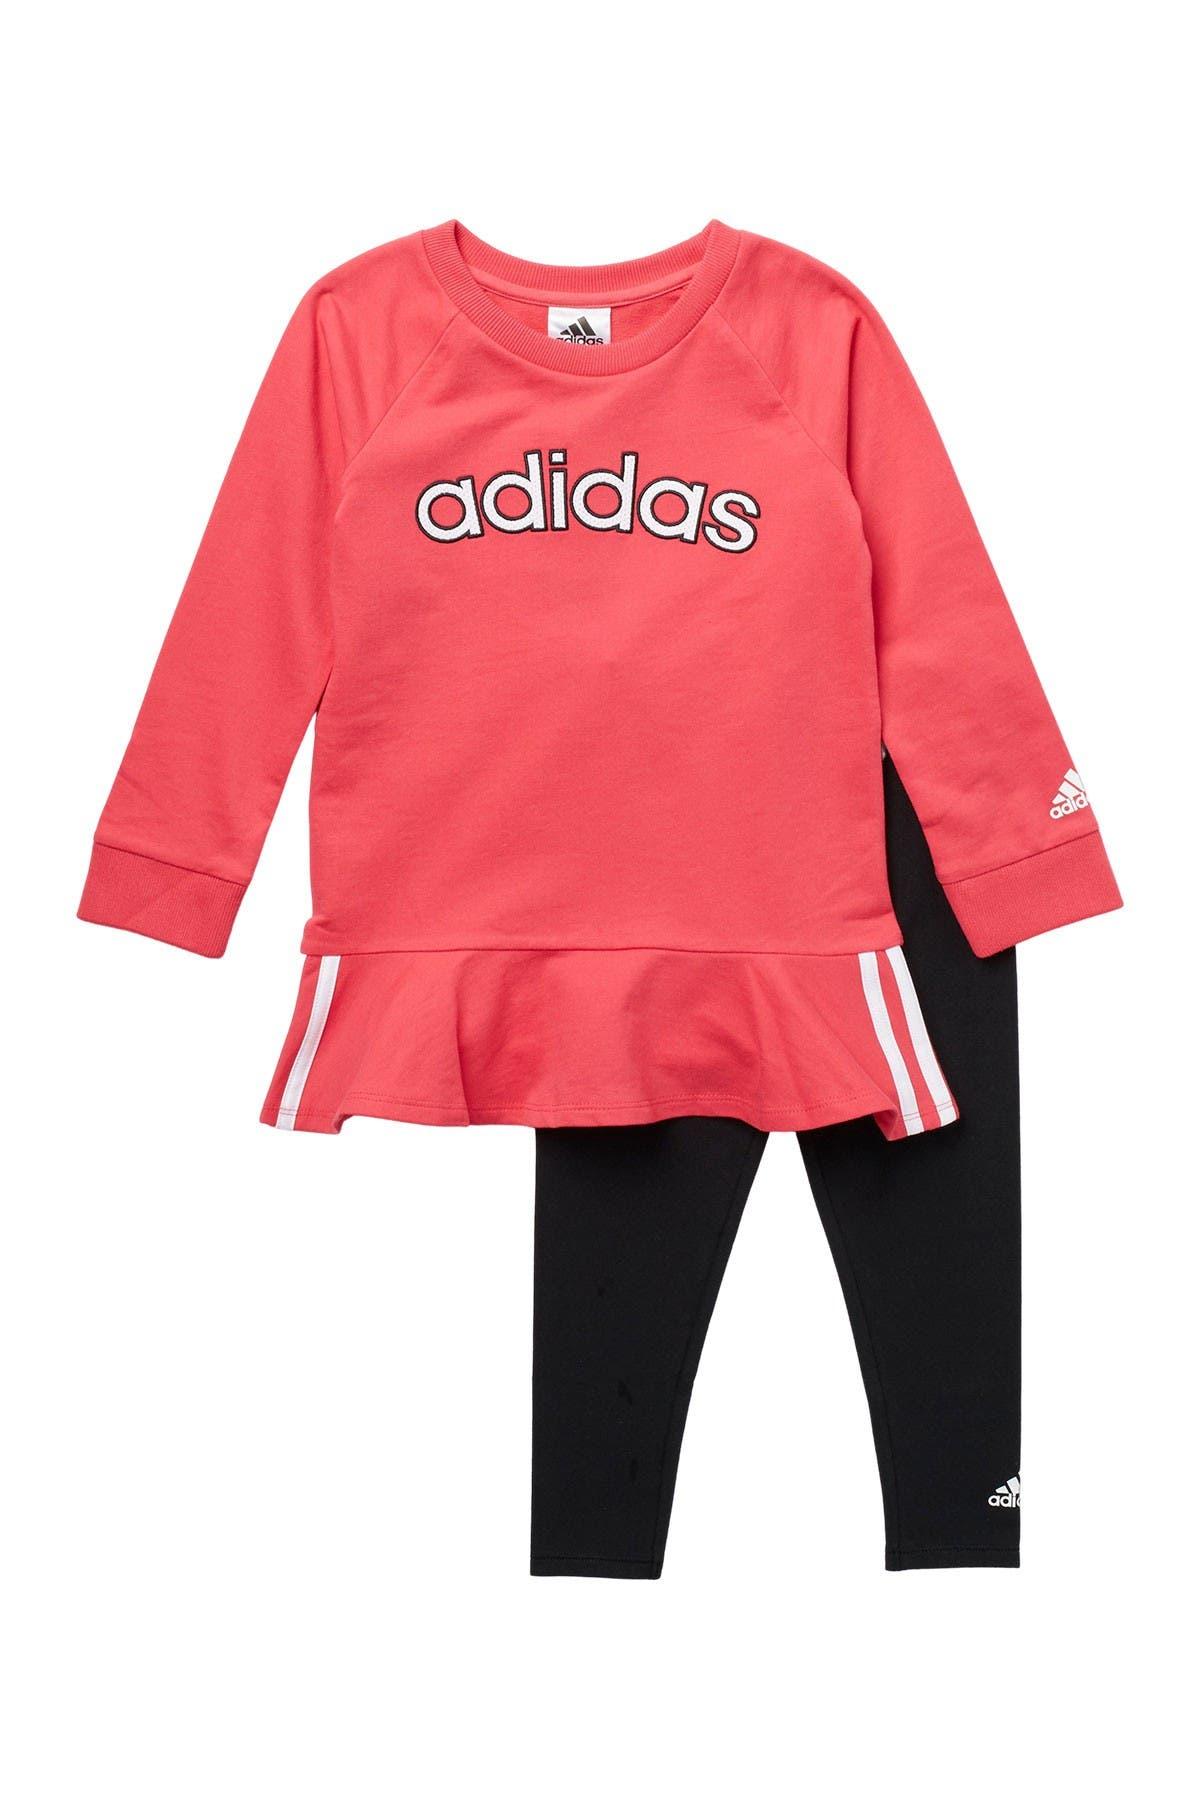 Image of adidas Varsity Dress & Leggings - 2-Piece Set